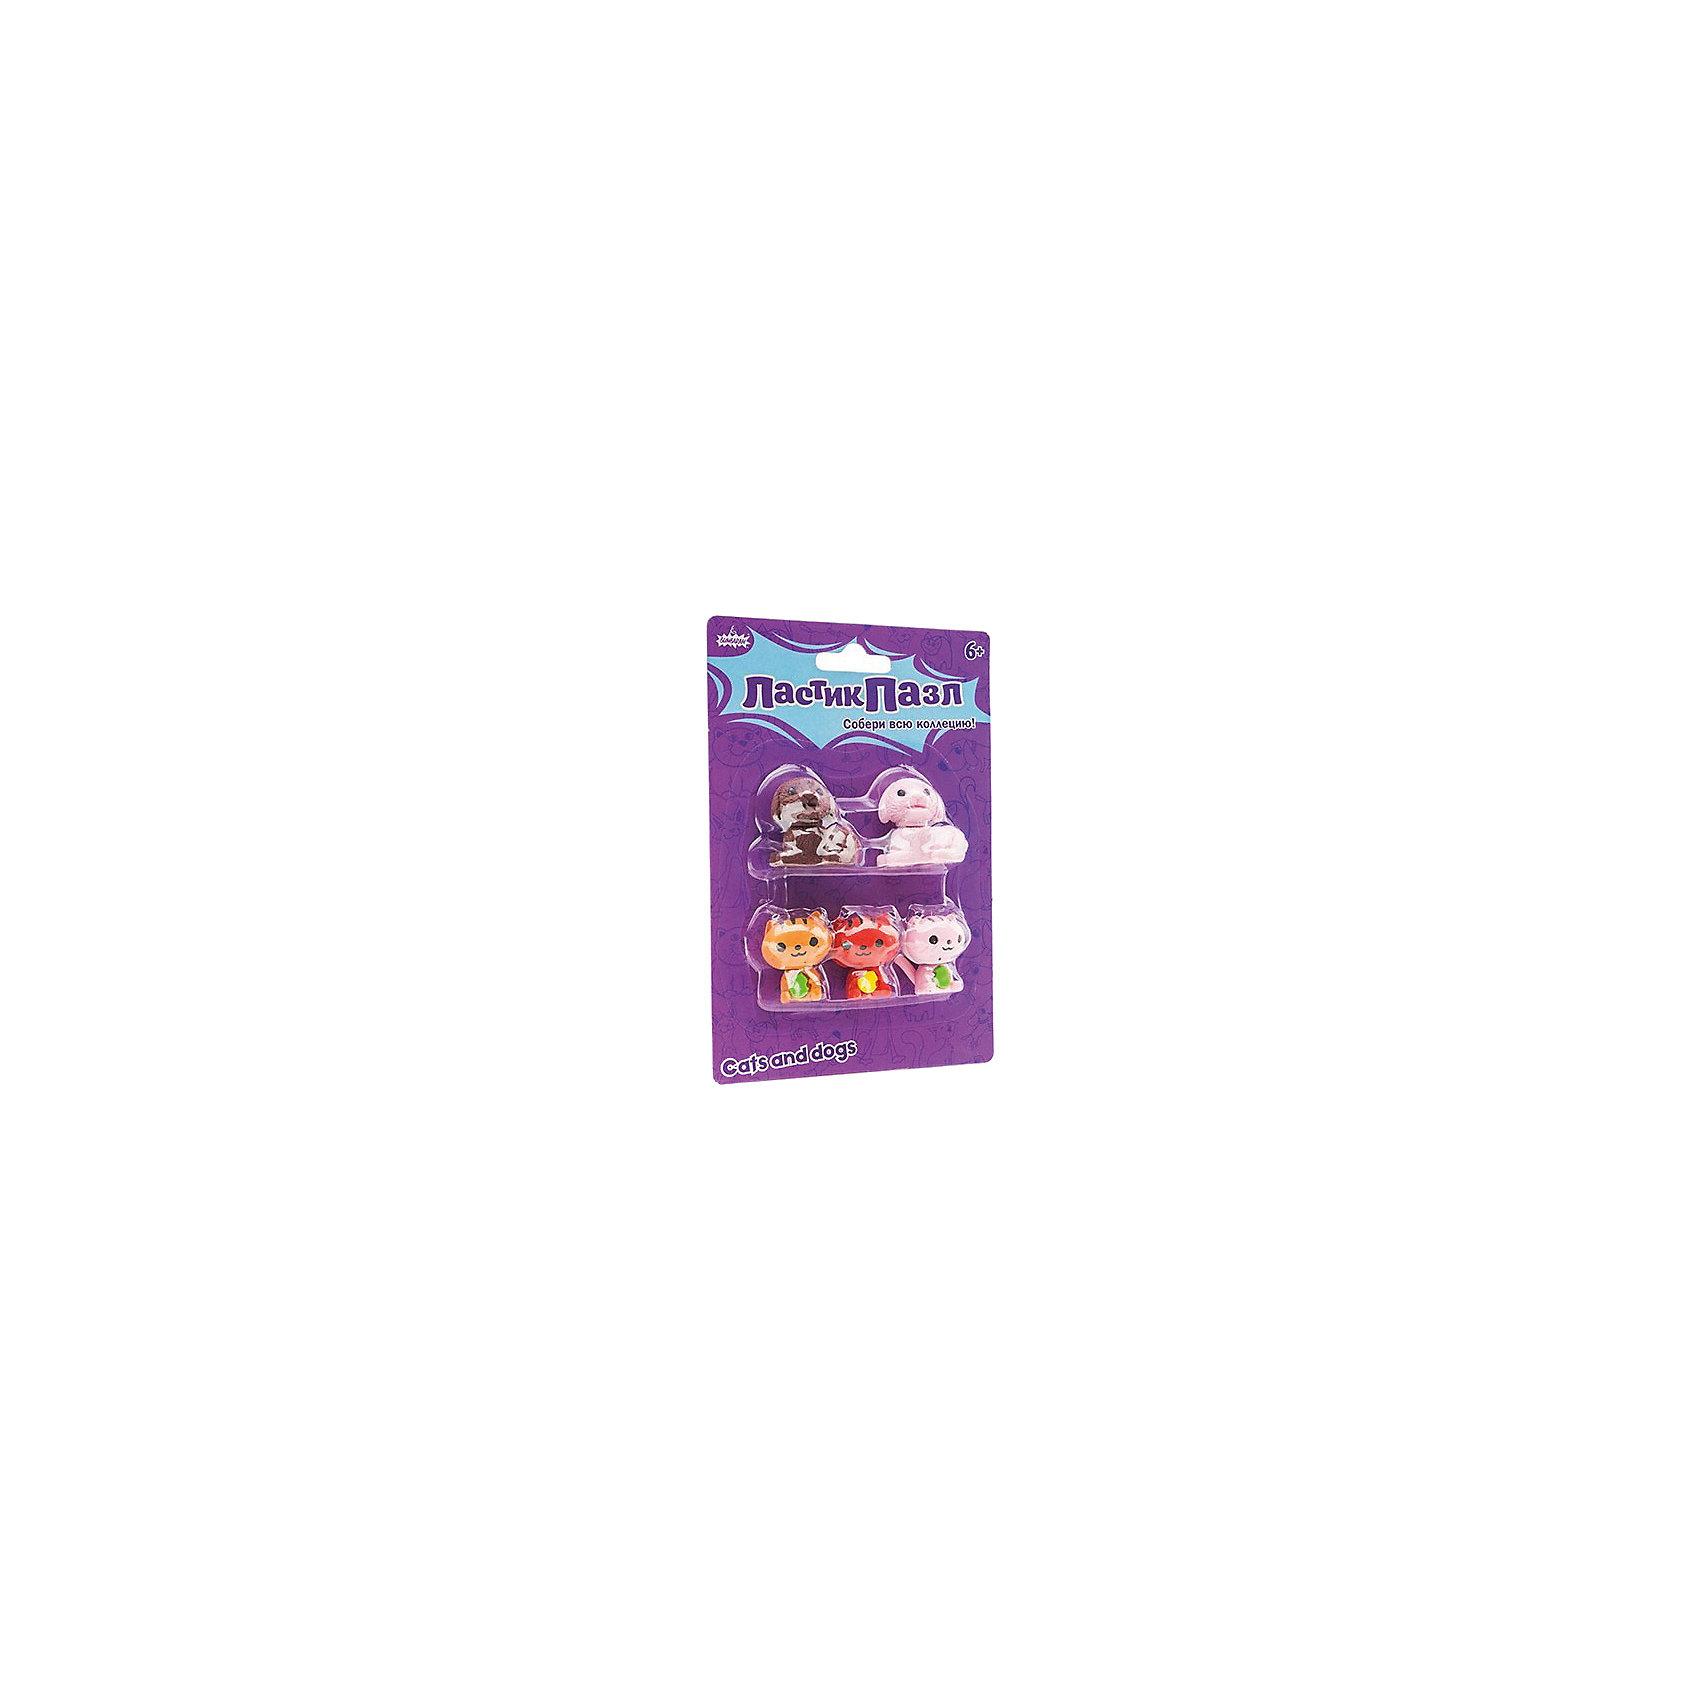 Бумбарам Набор фигурных ластиков Ластик-Пазл - Домашние любимцы Бумбарам бумбарам набор ластиков пазлов закуски бумбарам